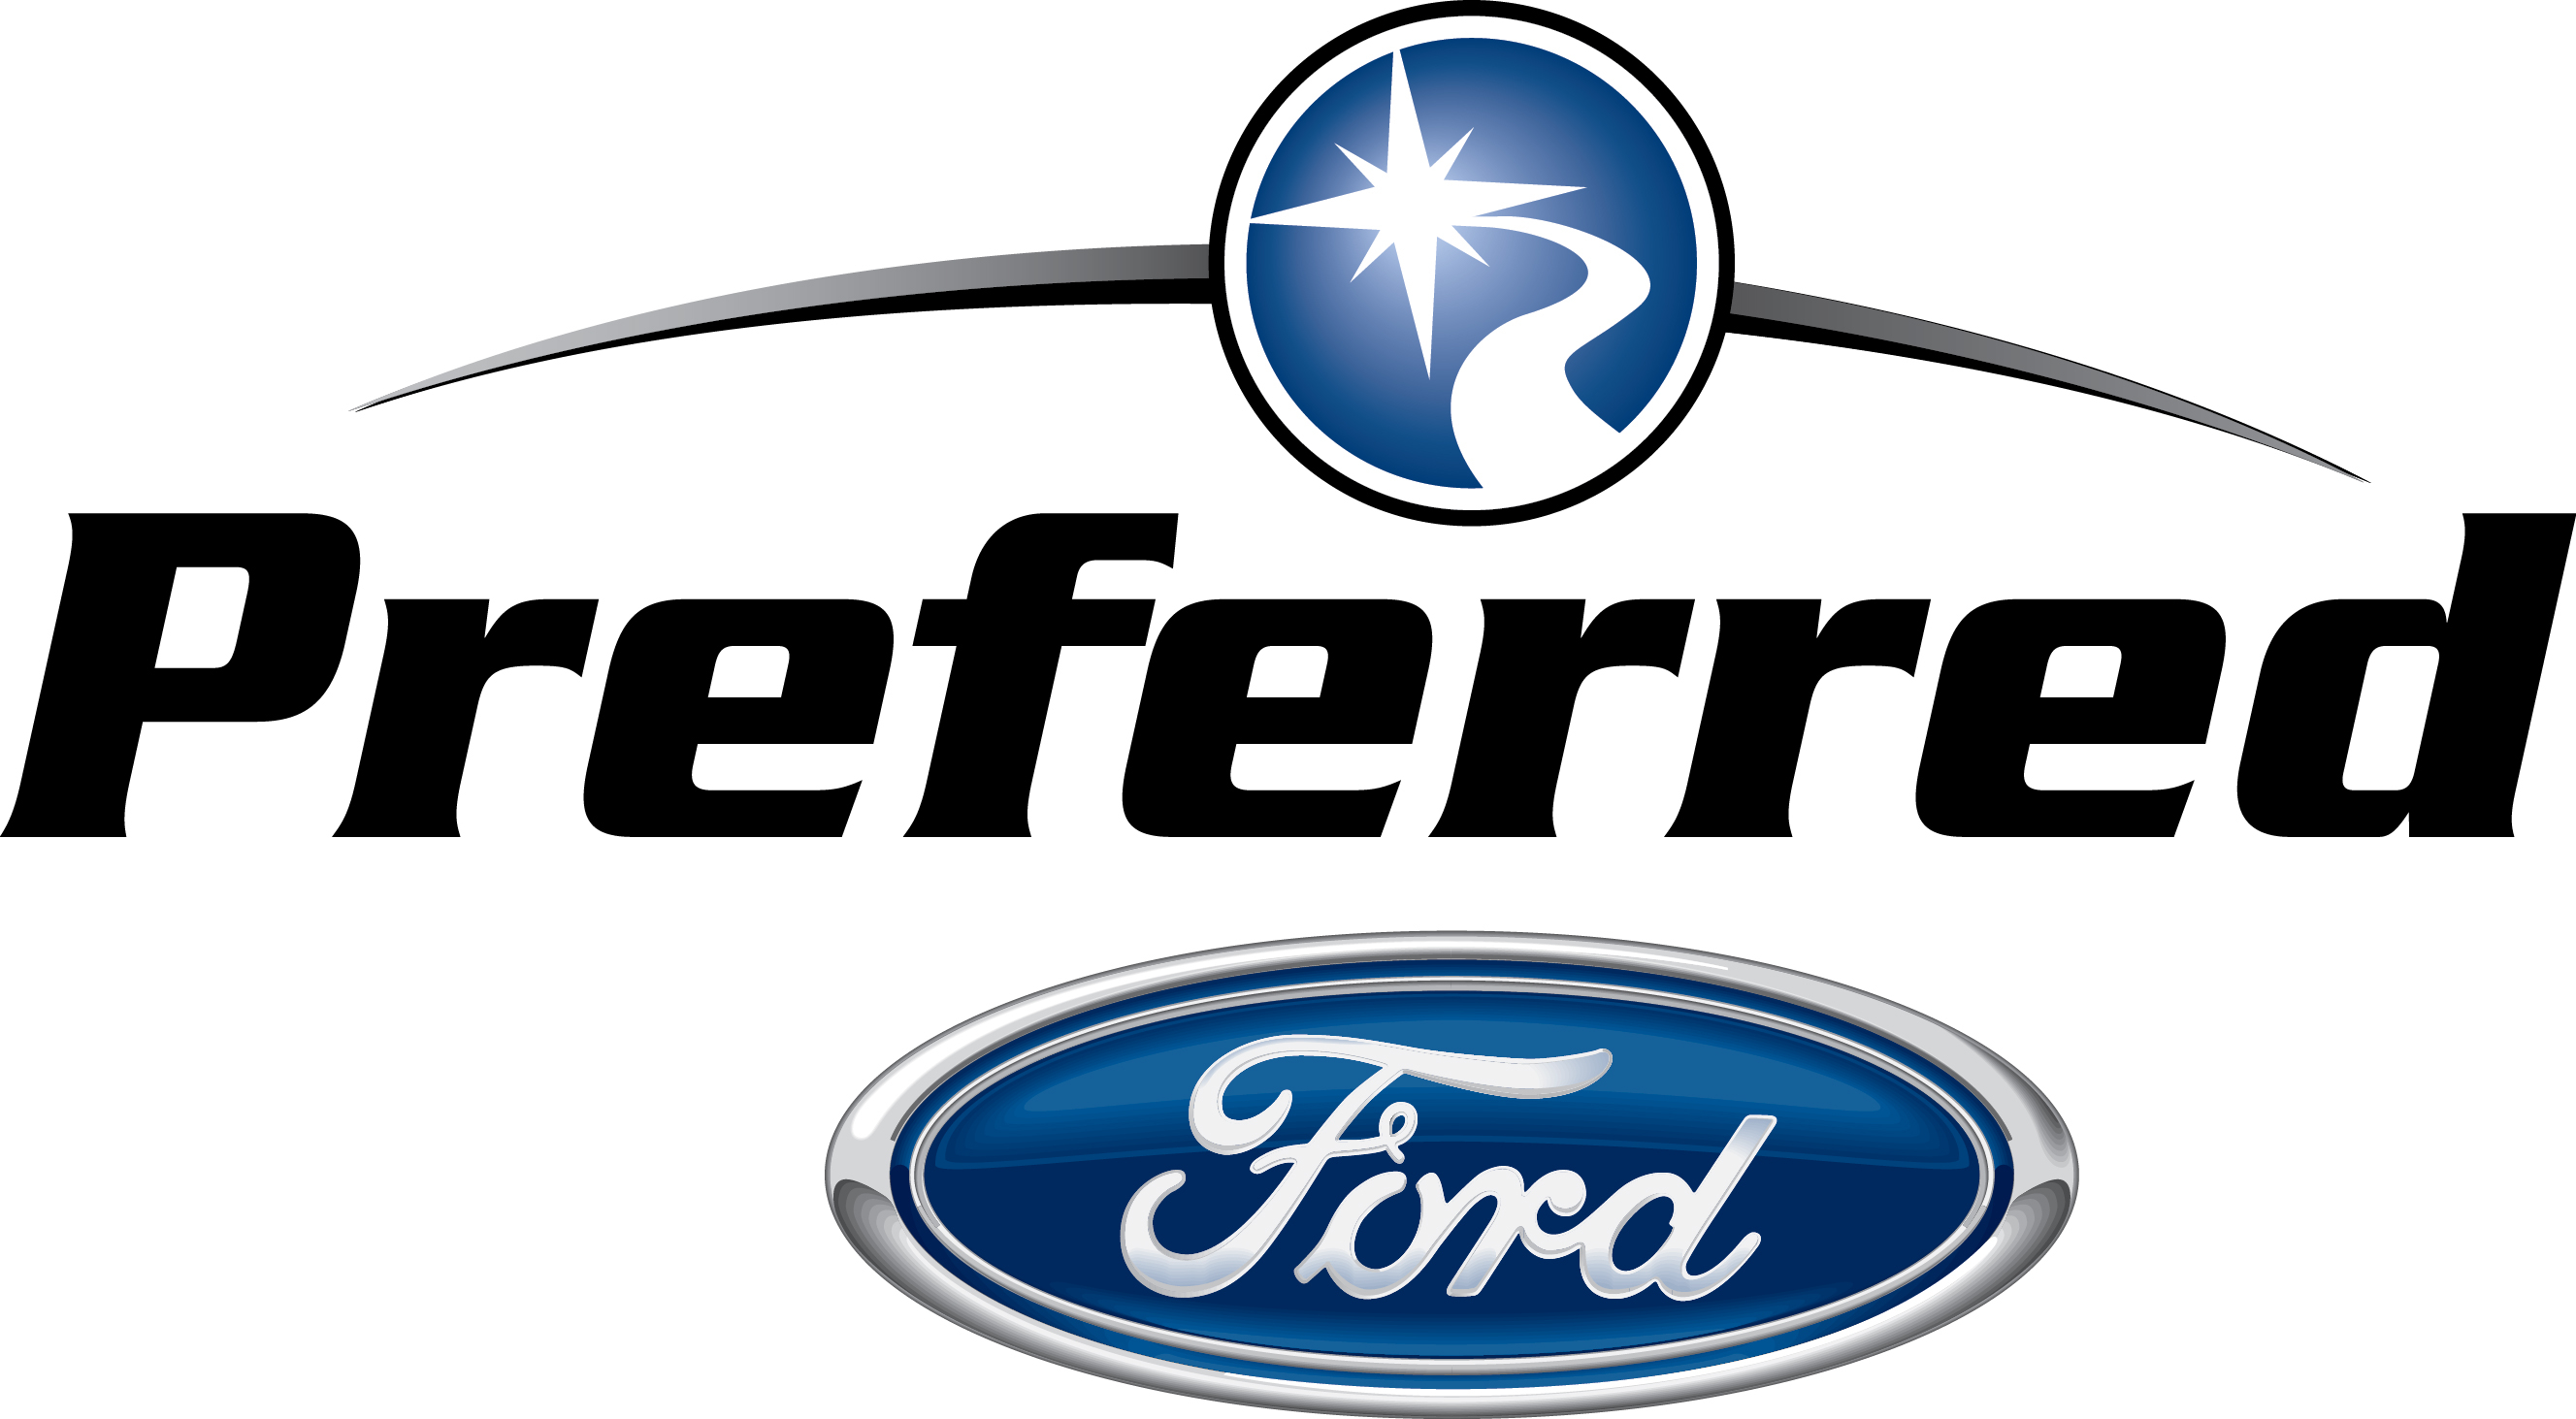 Preferred Ford